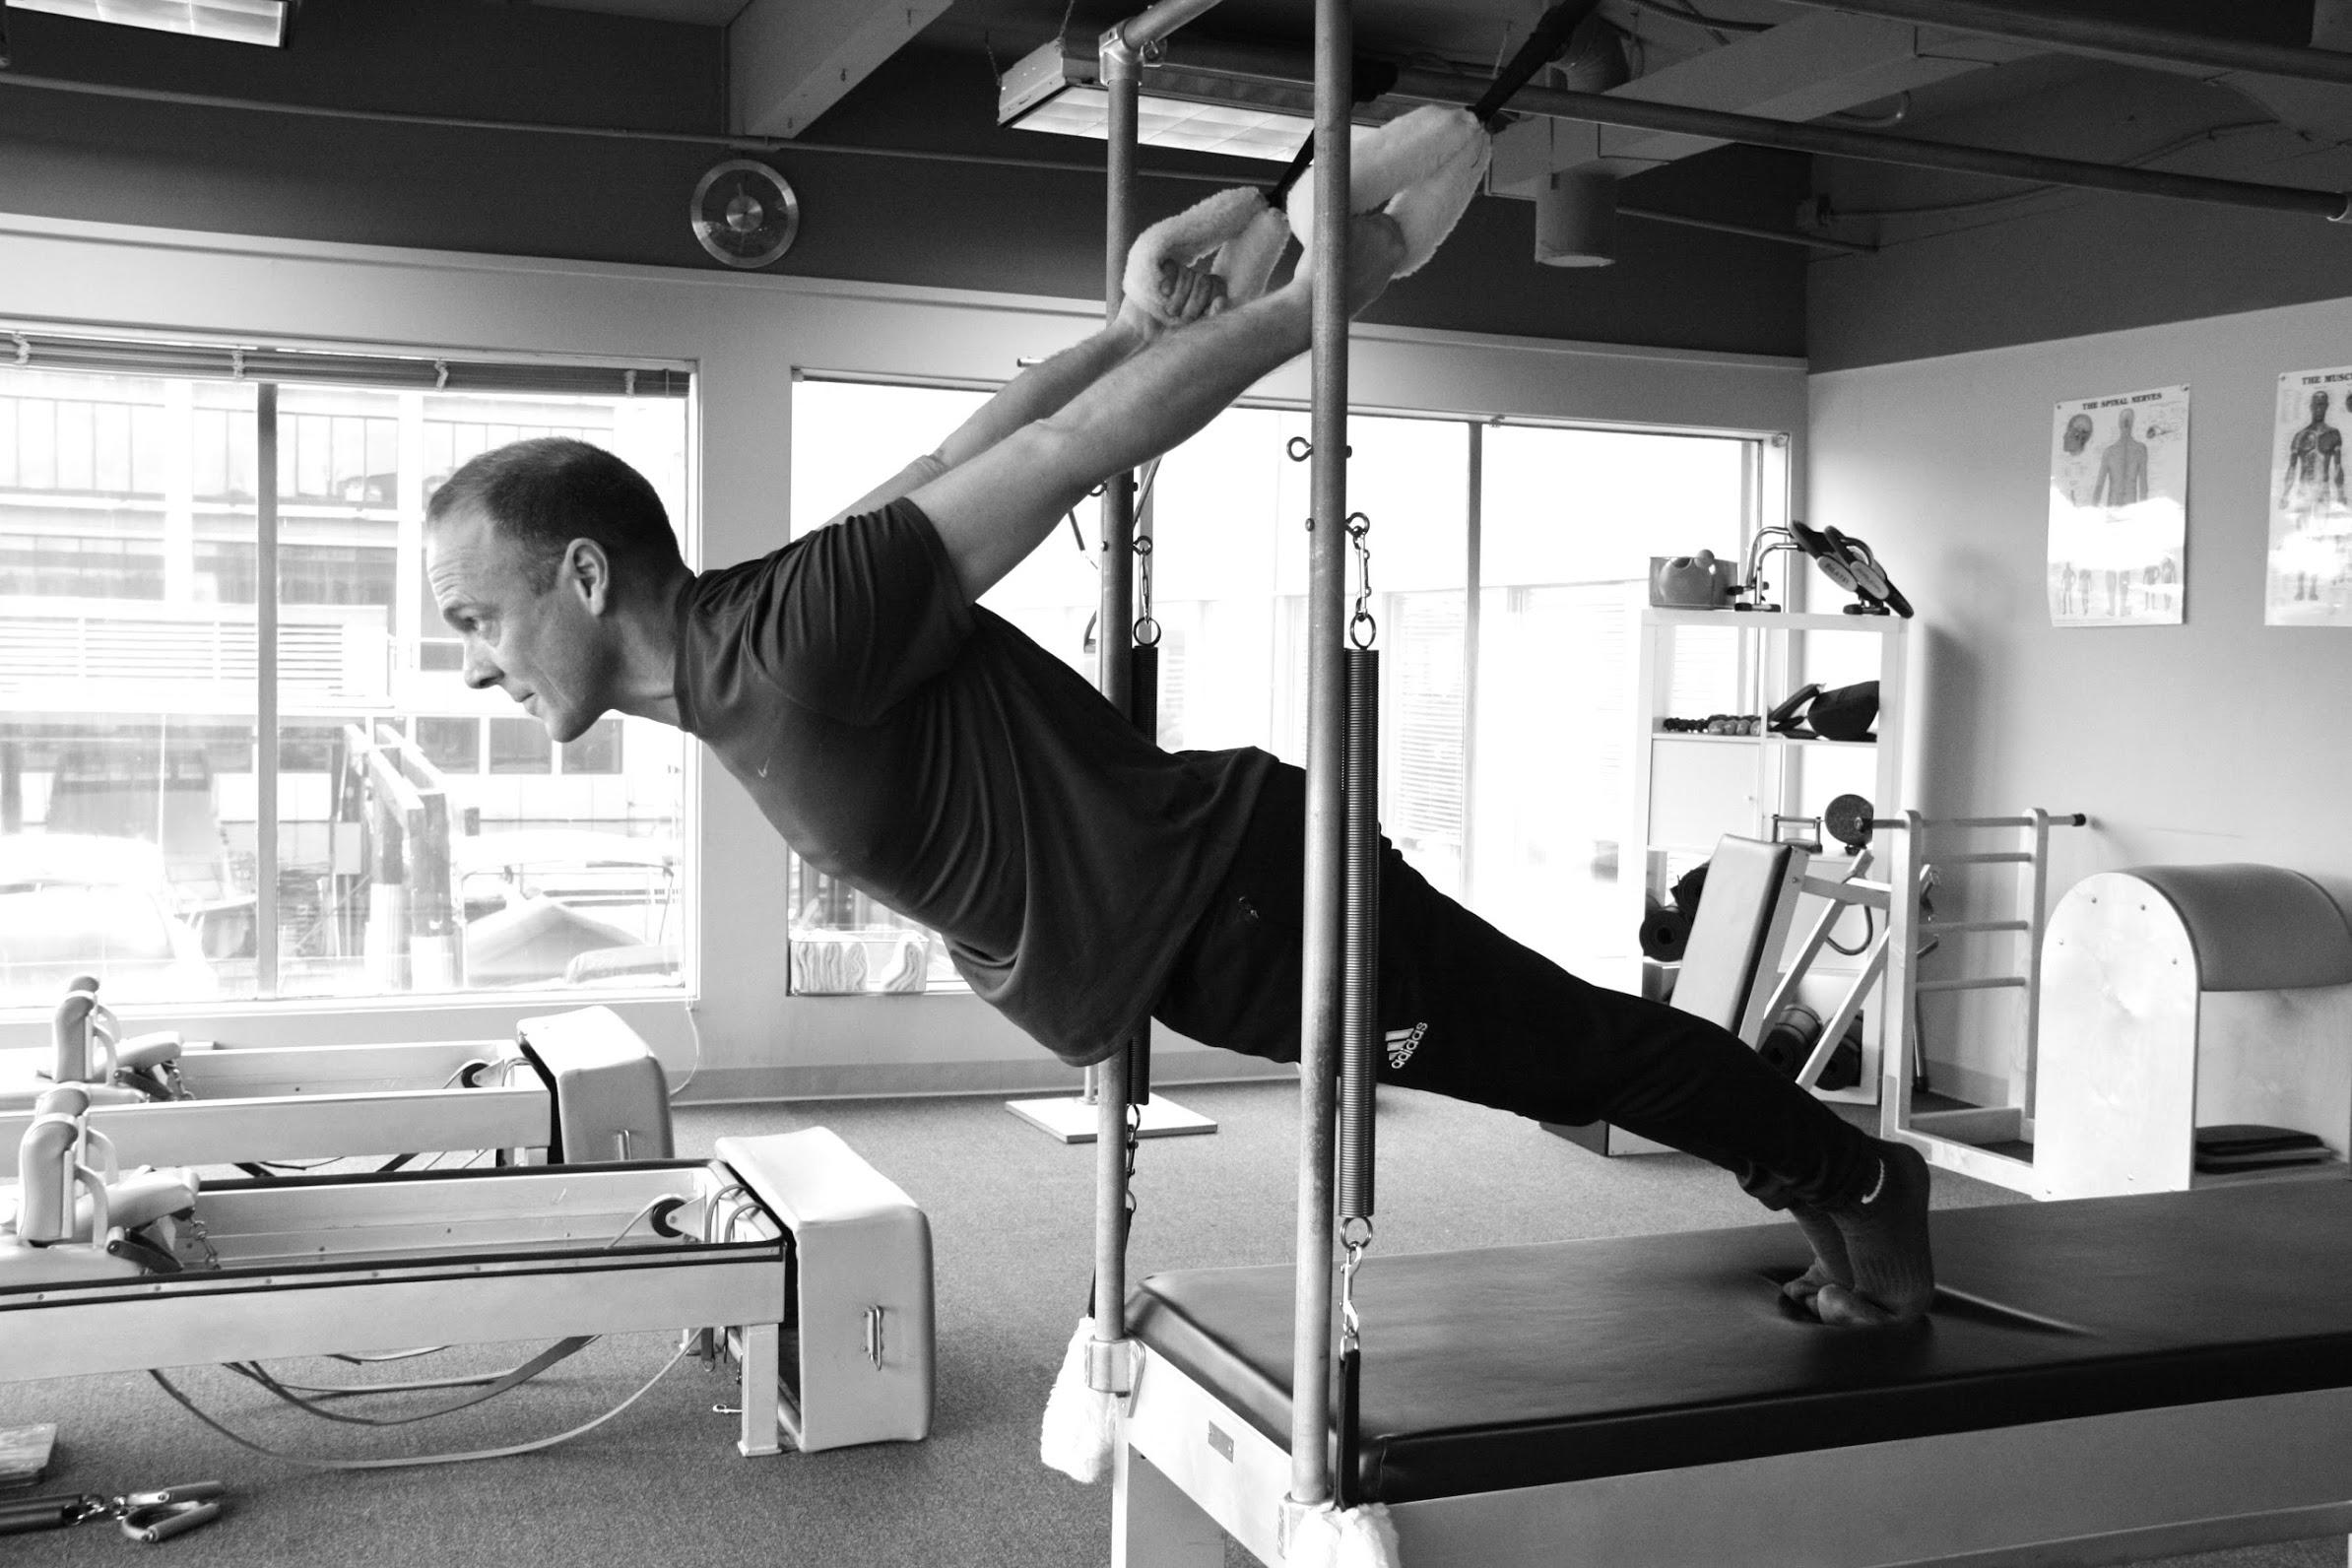 studiojacsk-south-lake-union-pilates-instructorbio-jack.jpg